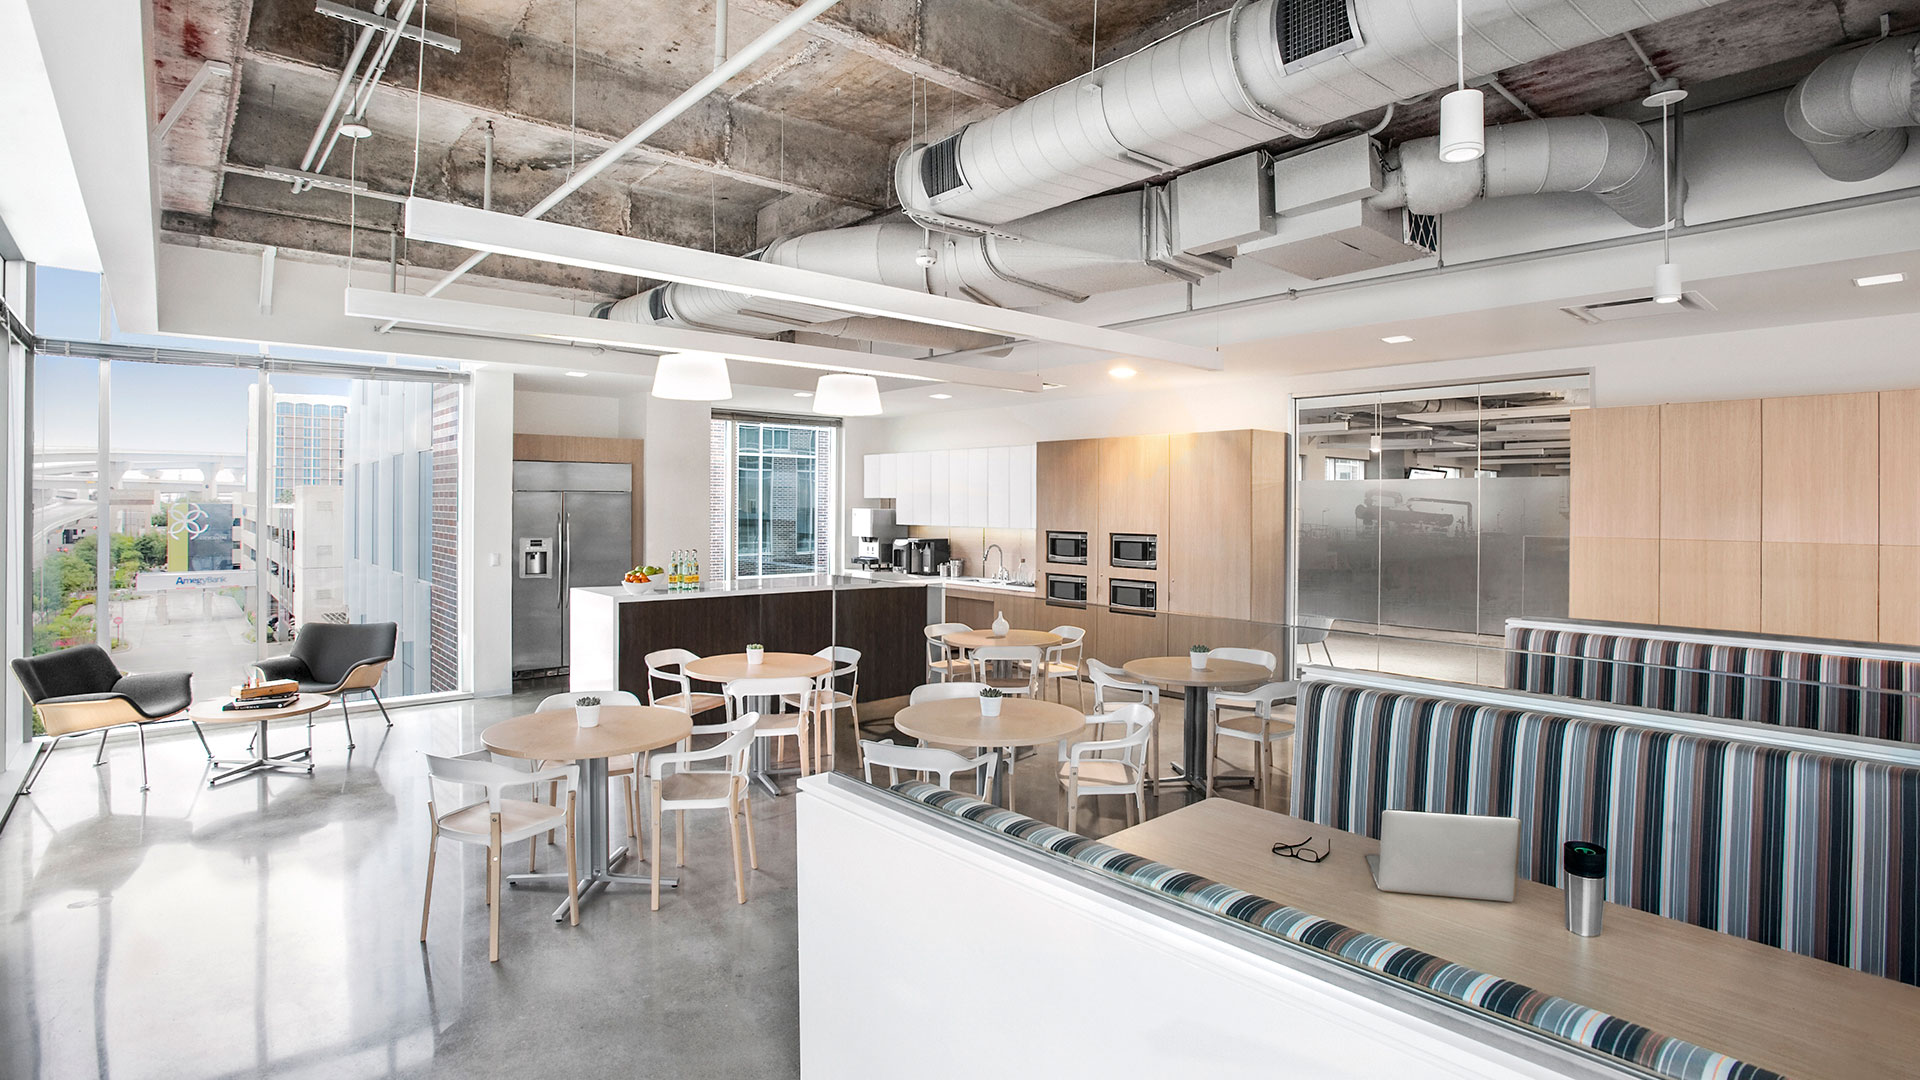 Corporate Interior Design City Center Houston Breakroom Natural Light Exposed Ceiling